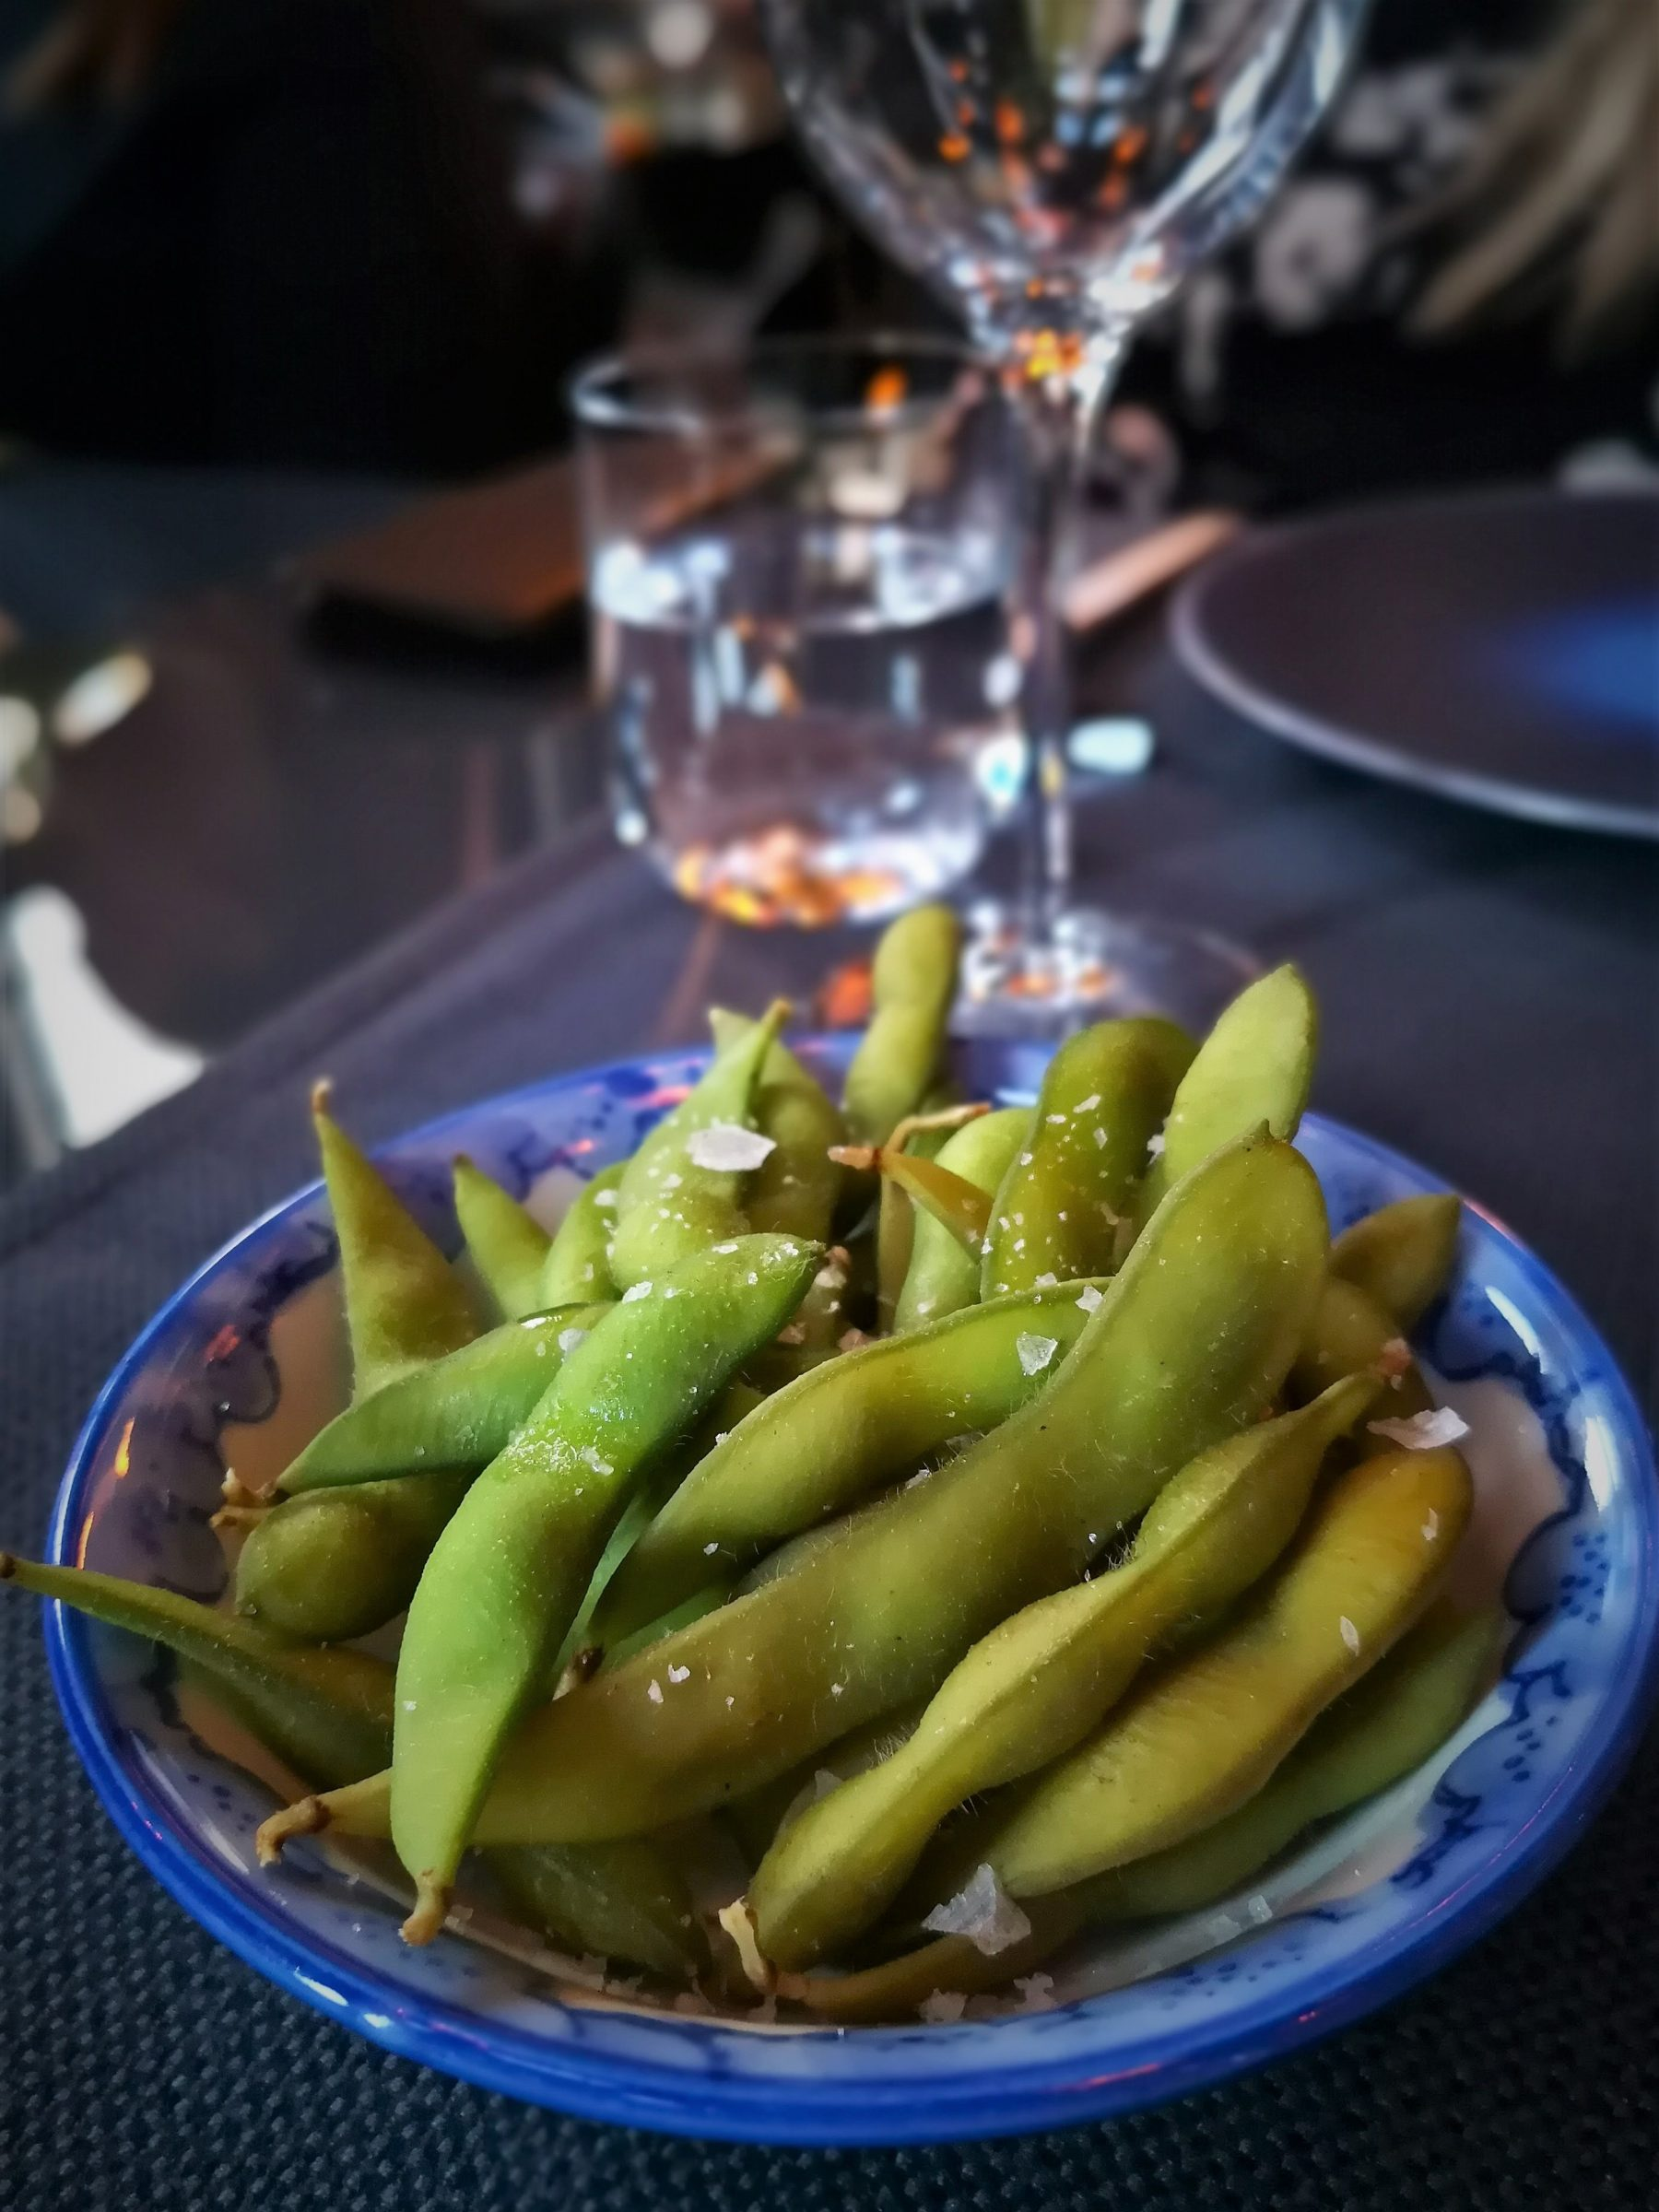 Amsterdamin ravintolat